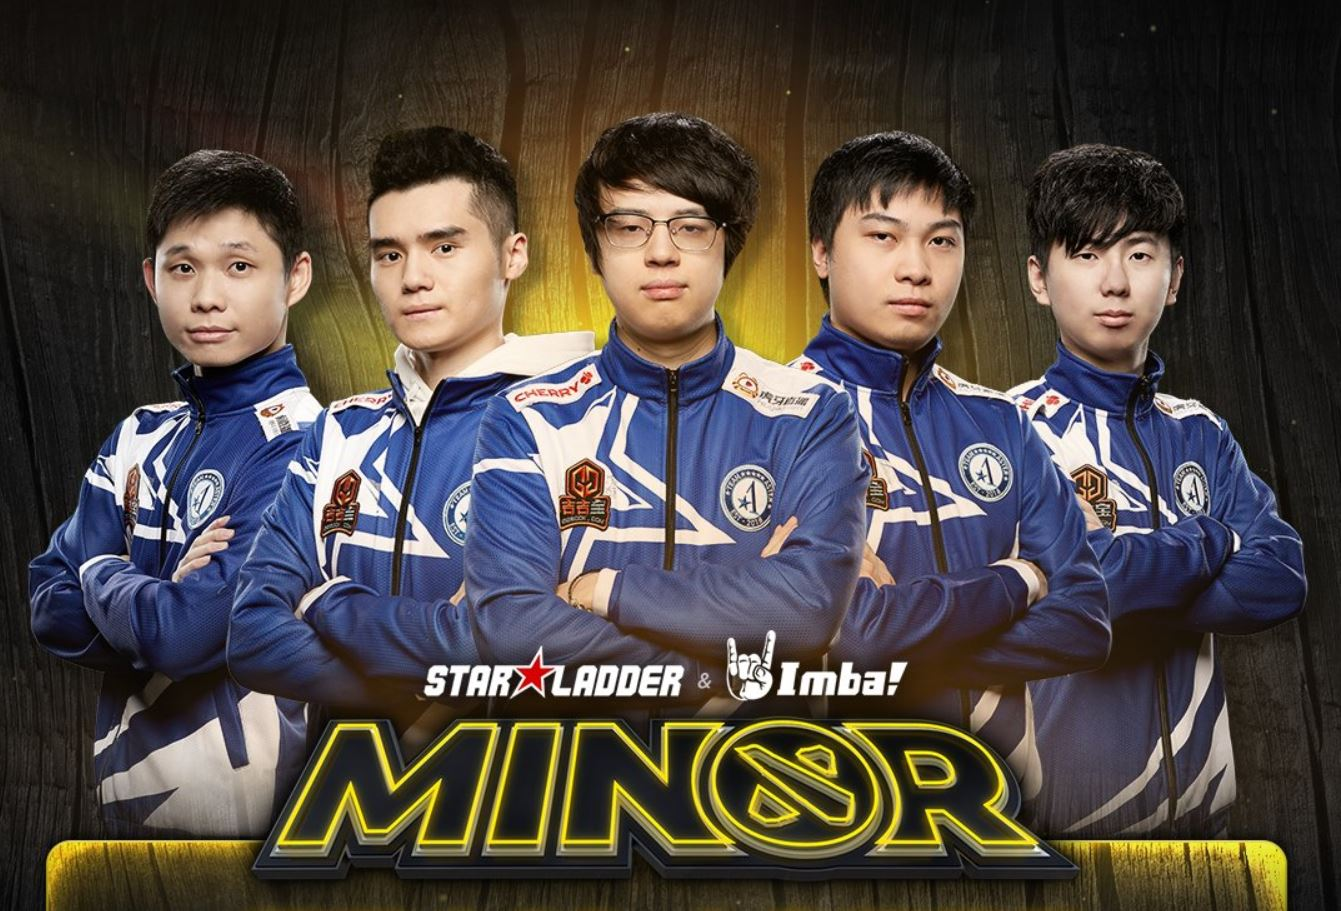 Team Aster, Korona virüs şüphesiyle 4 oyuncusunu karantinaya aldı